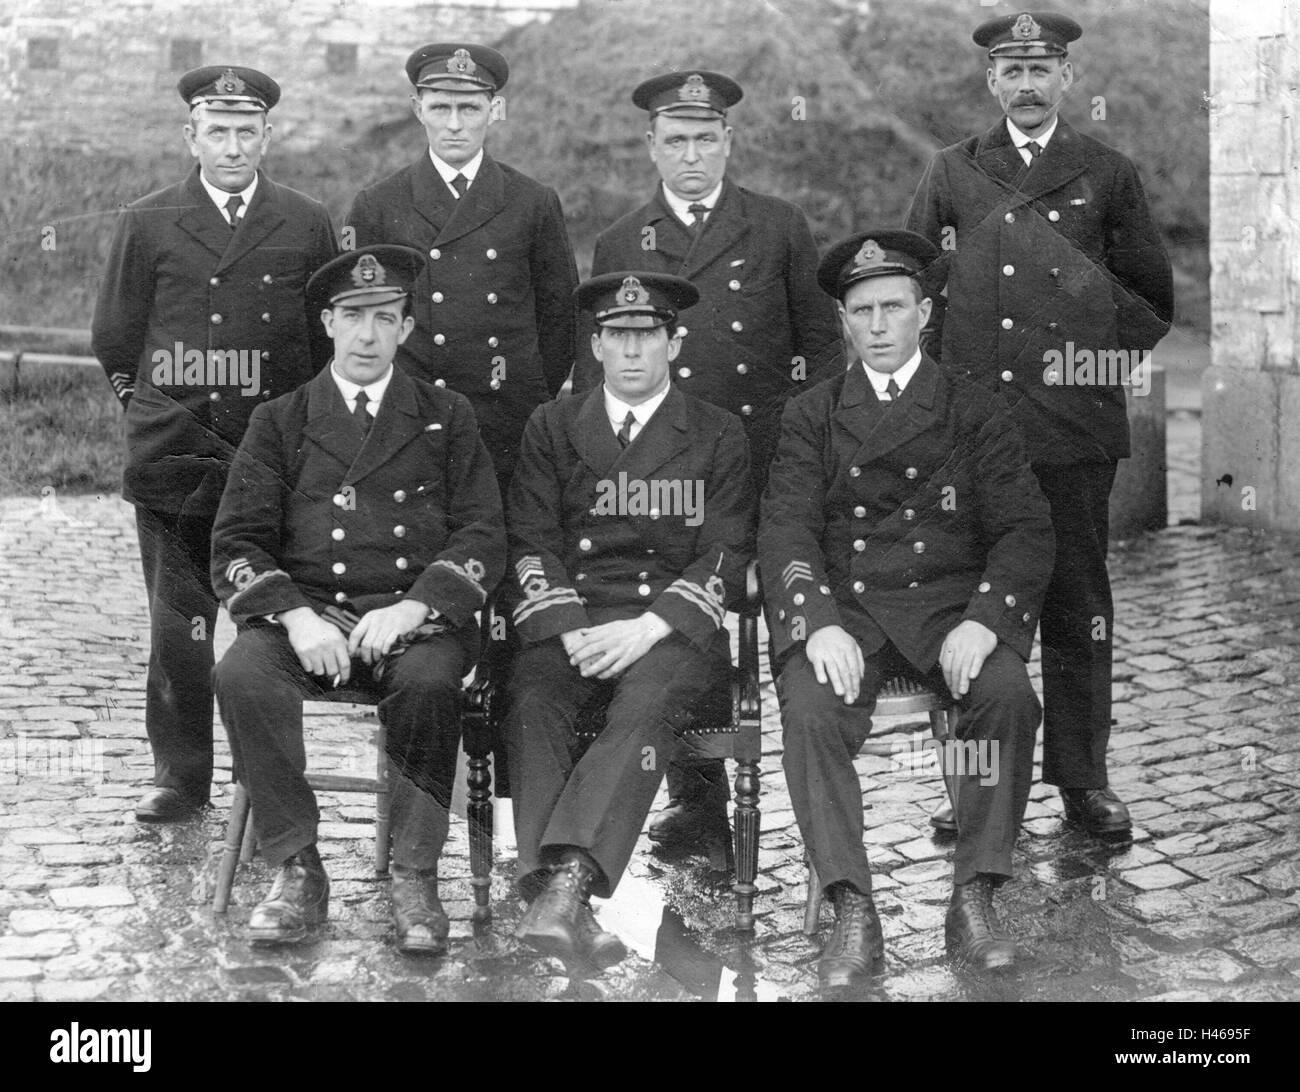 Royal Navy Officer Ww1 Stock Photo